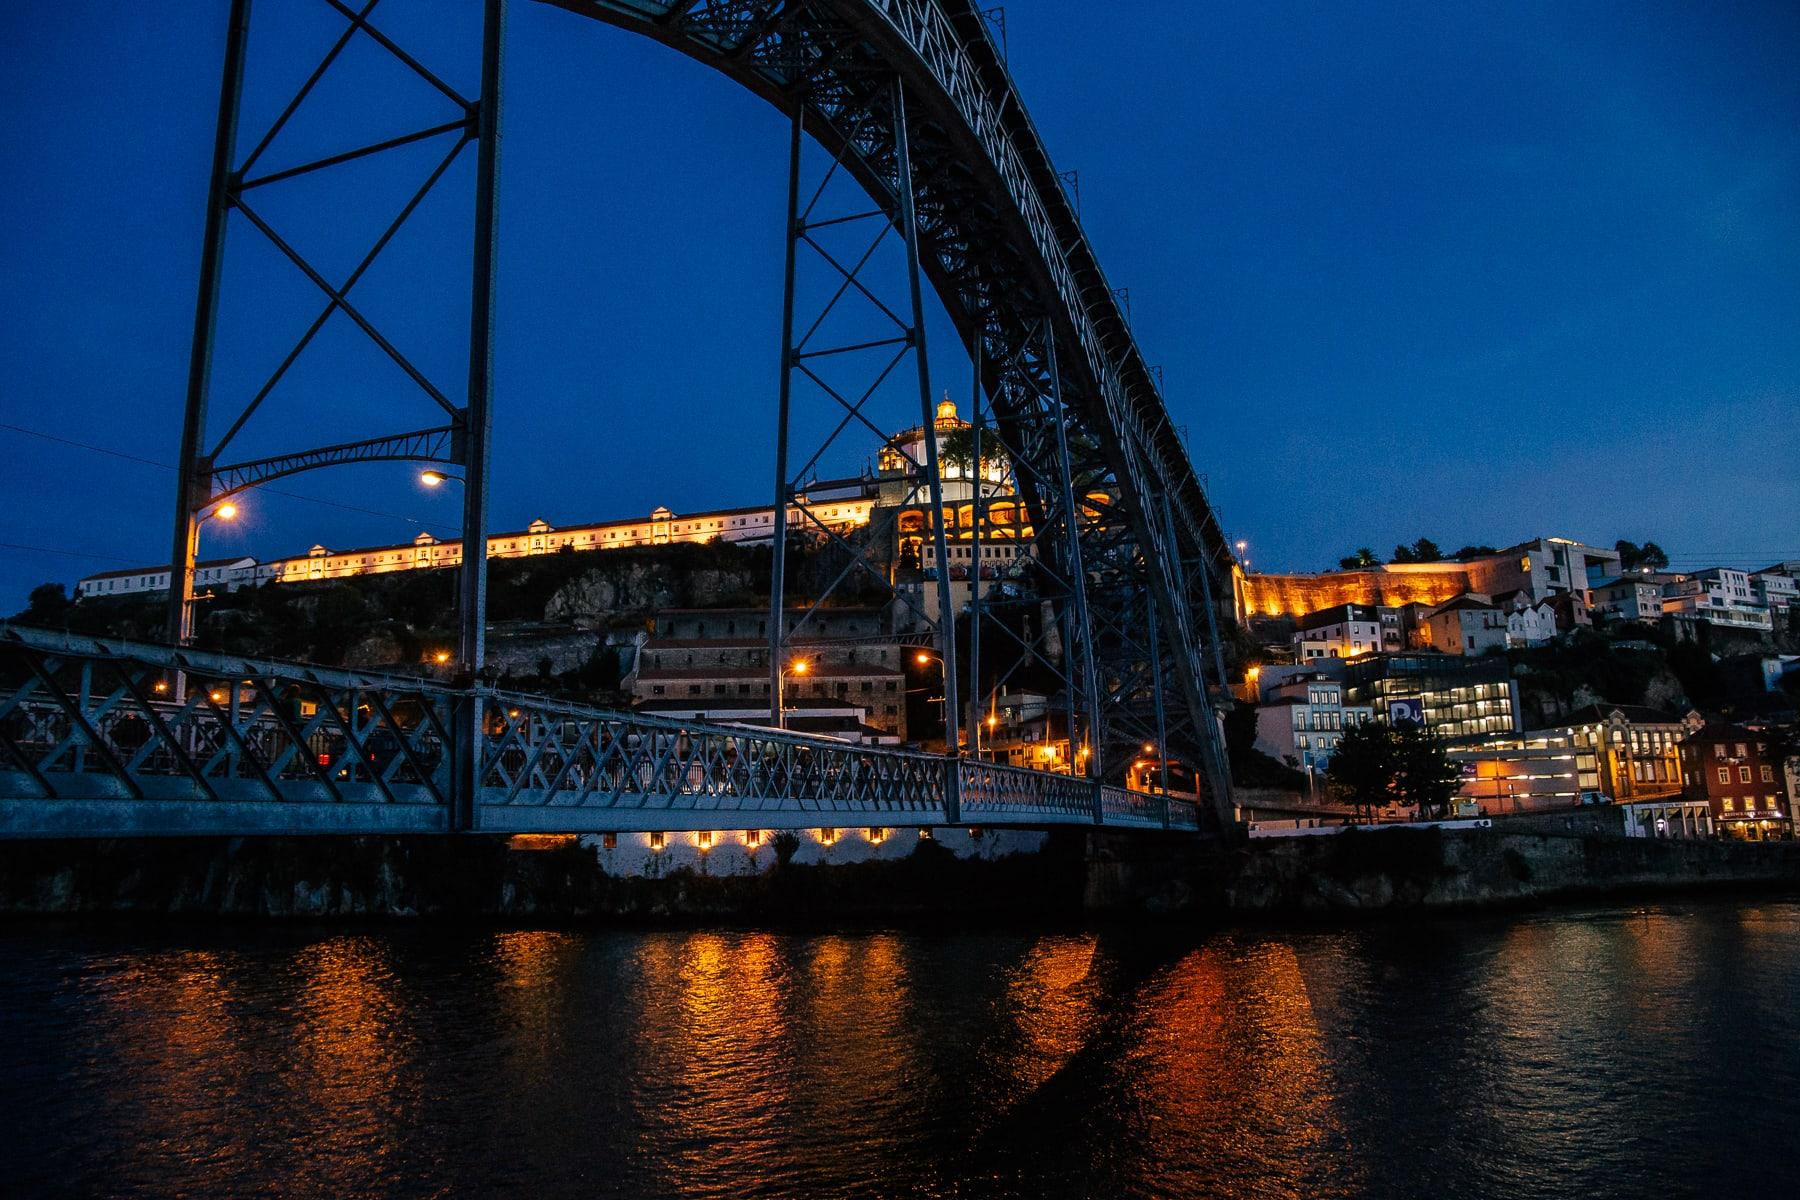 zehn-porto-tipps-fuer-deine-staedtereise-in-portugal-reiseblog-des-belles-choses 31